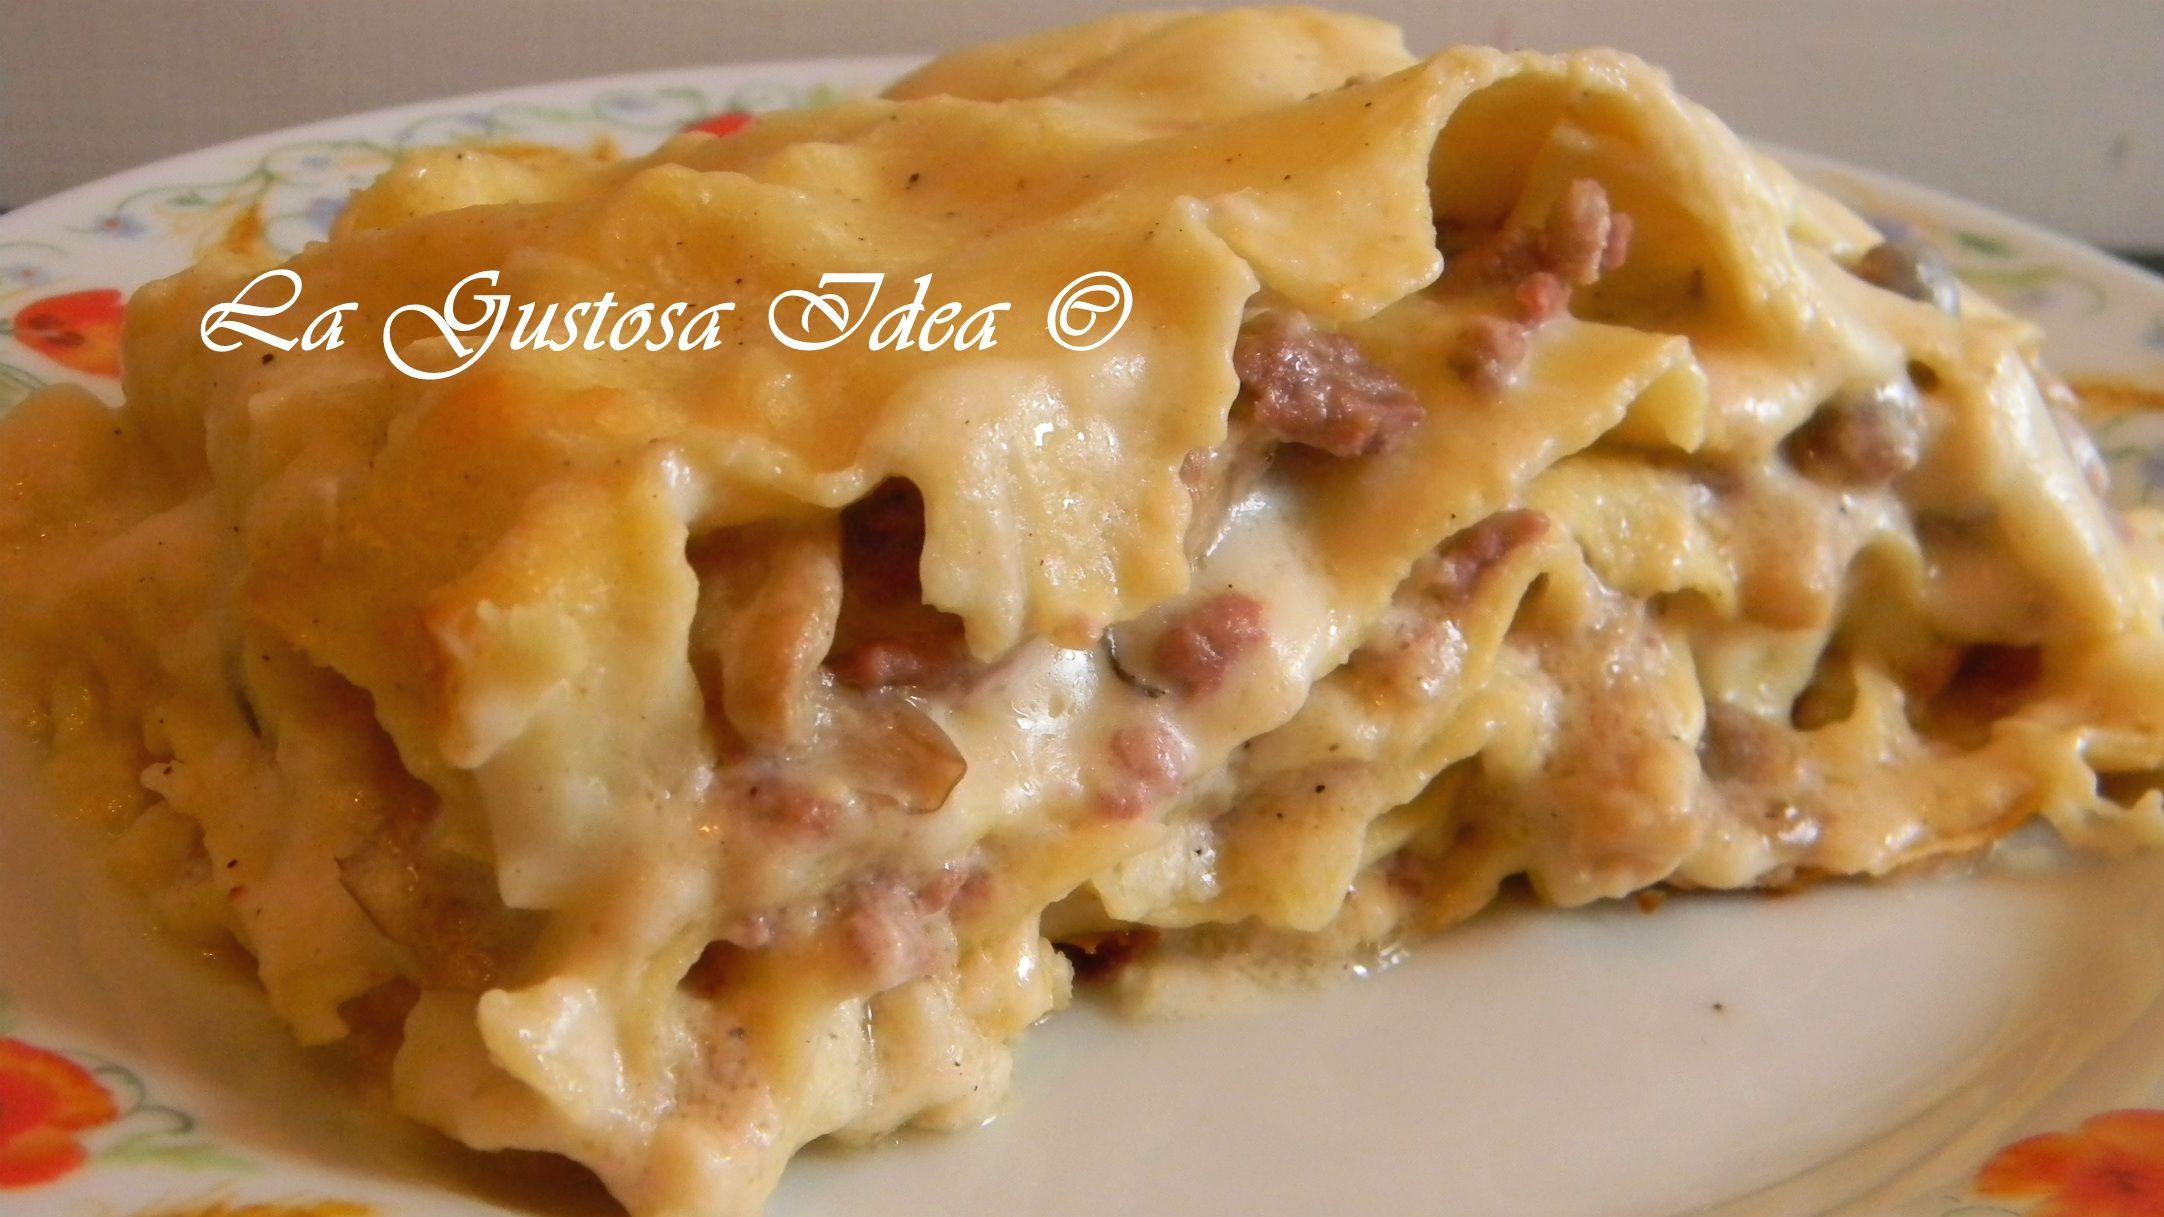 Ricetta Lasagne Funghi E Salsiccia.Lasagna Bianca Con Funghi E Salsiccia La Gustosa Idea Ricette Idee Alimentari Ricette Di Cucina